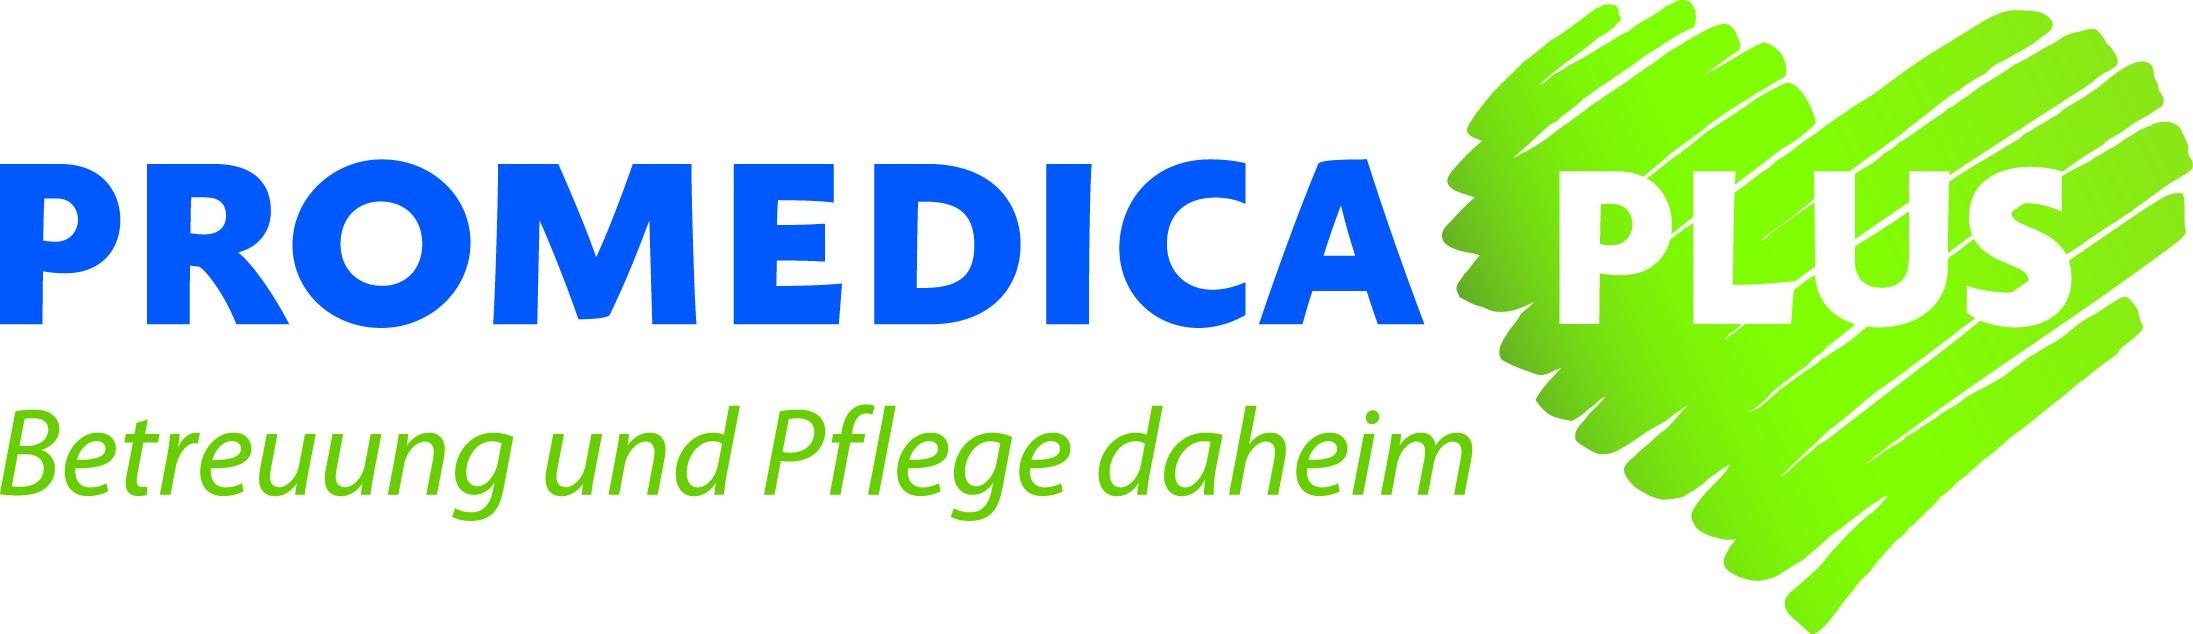 Logo PROMEDICA Plus Siebengebirge